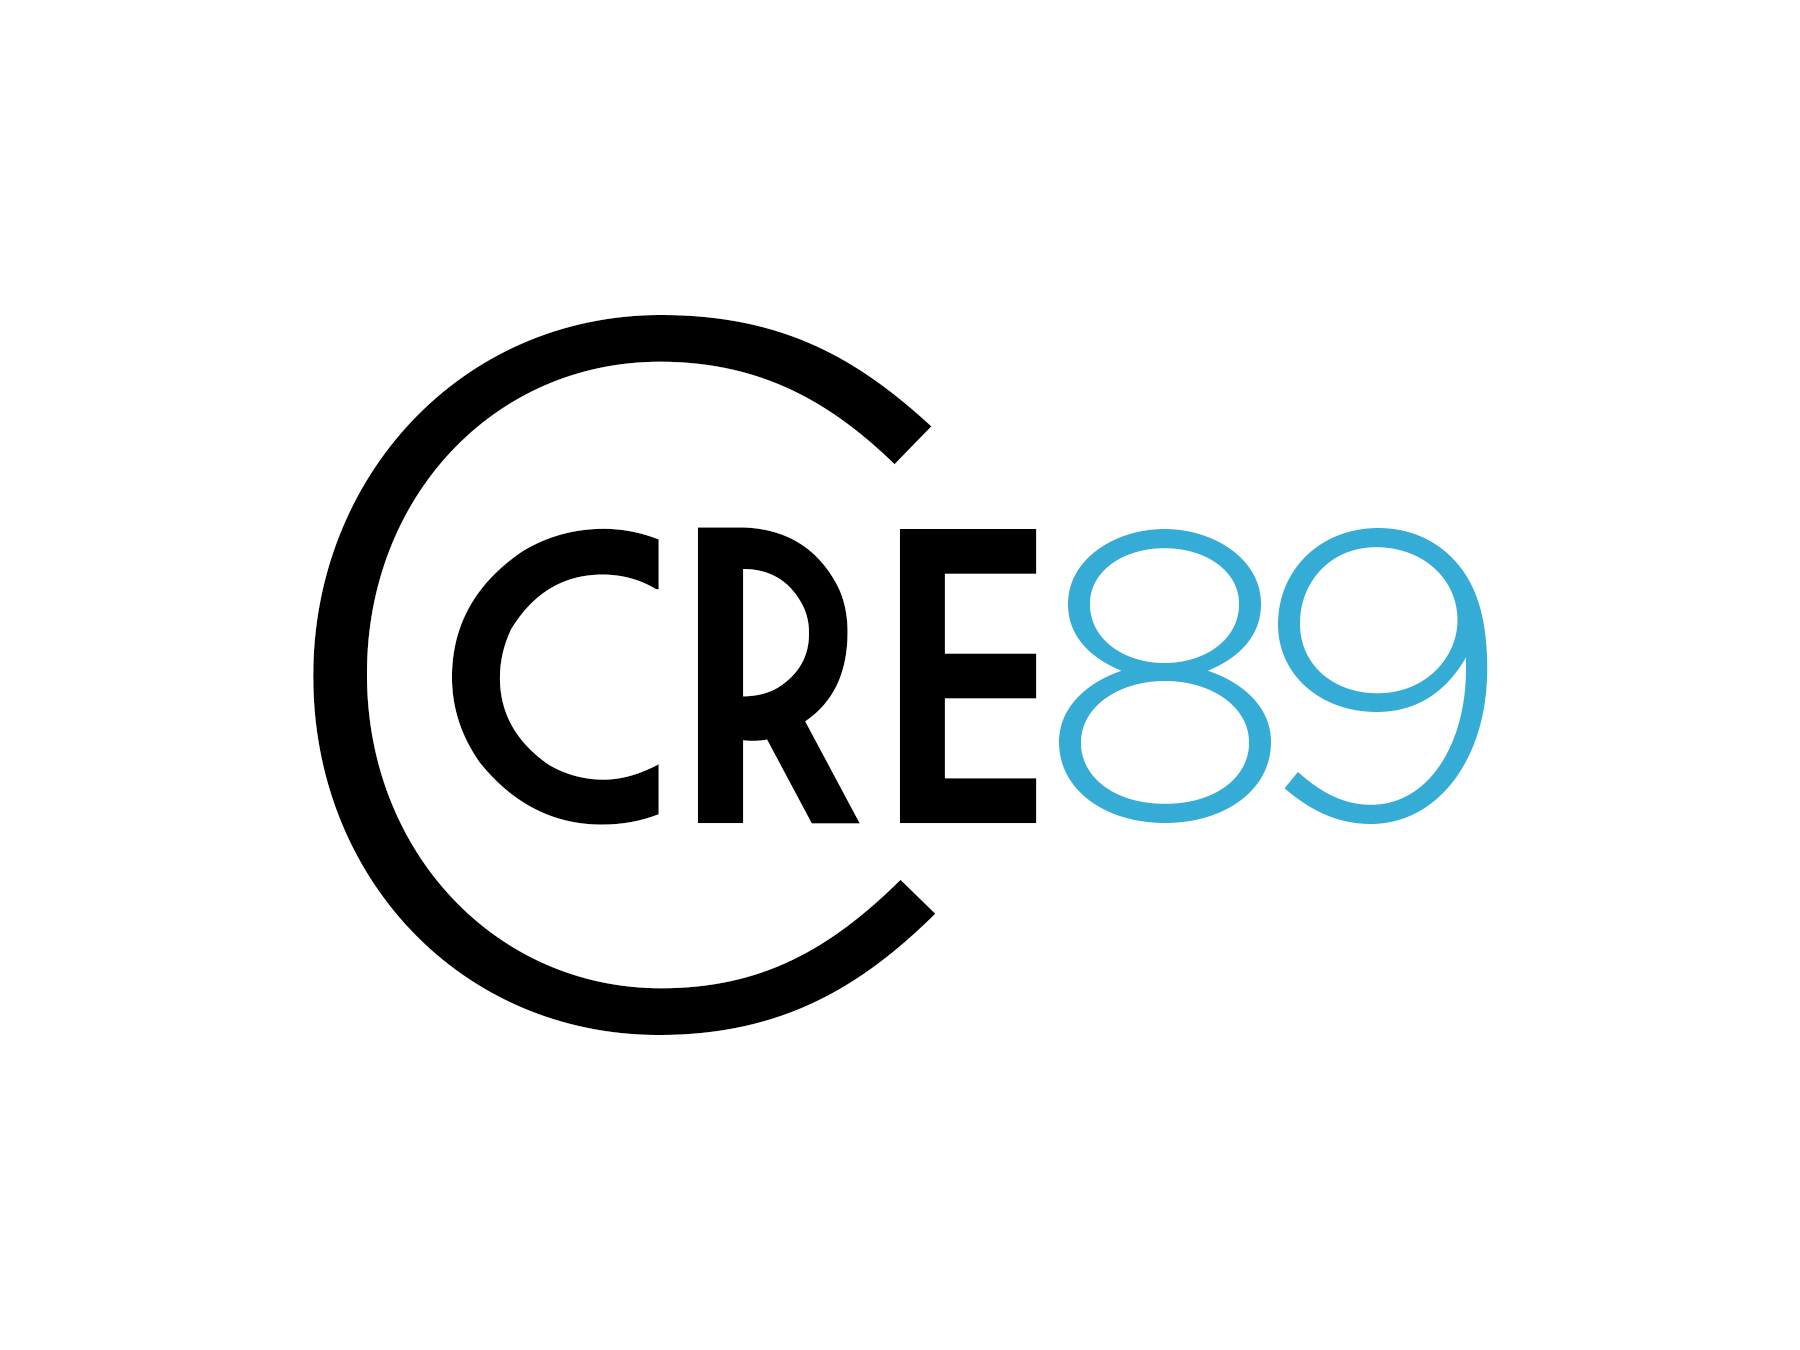 CRE89.jpg